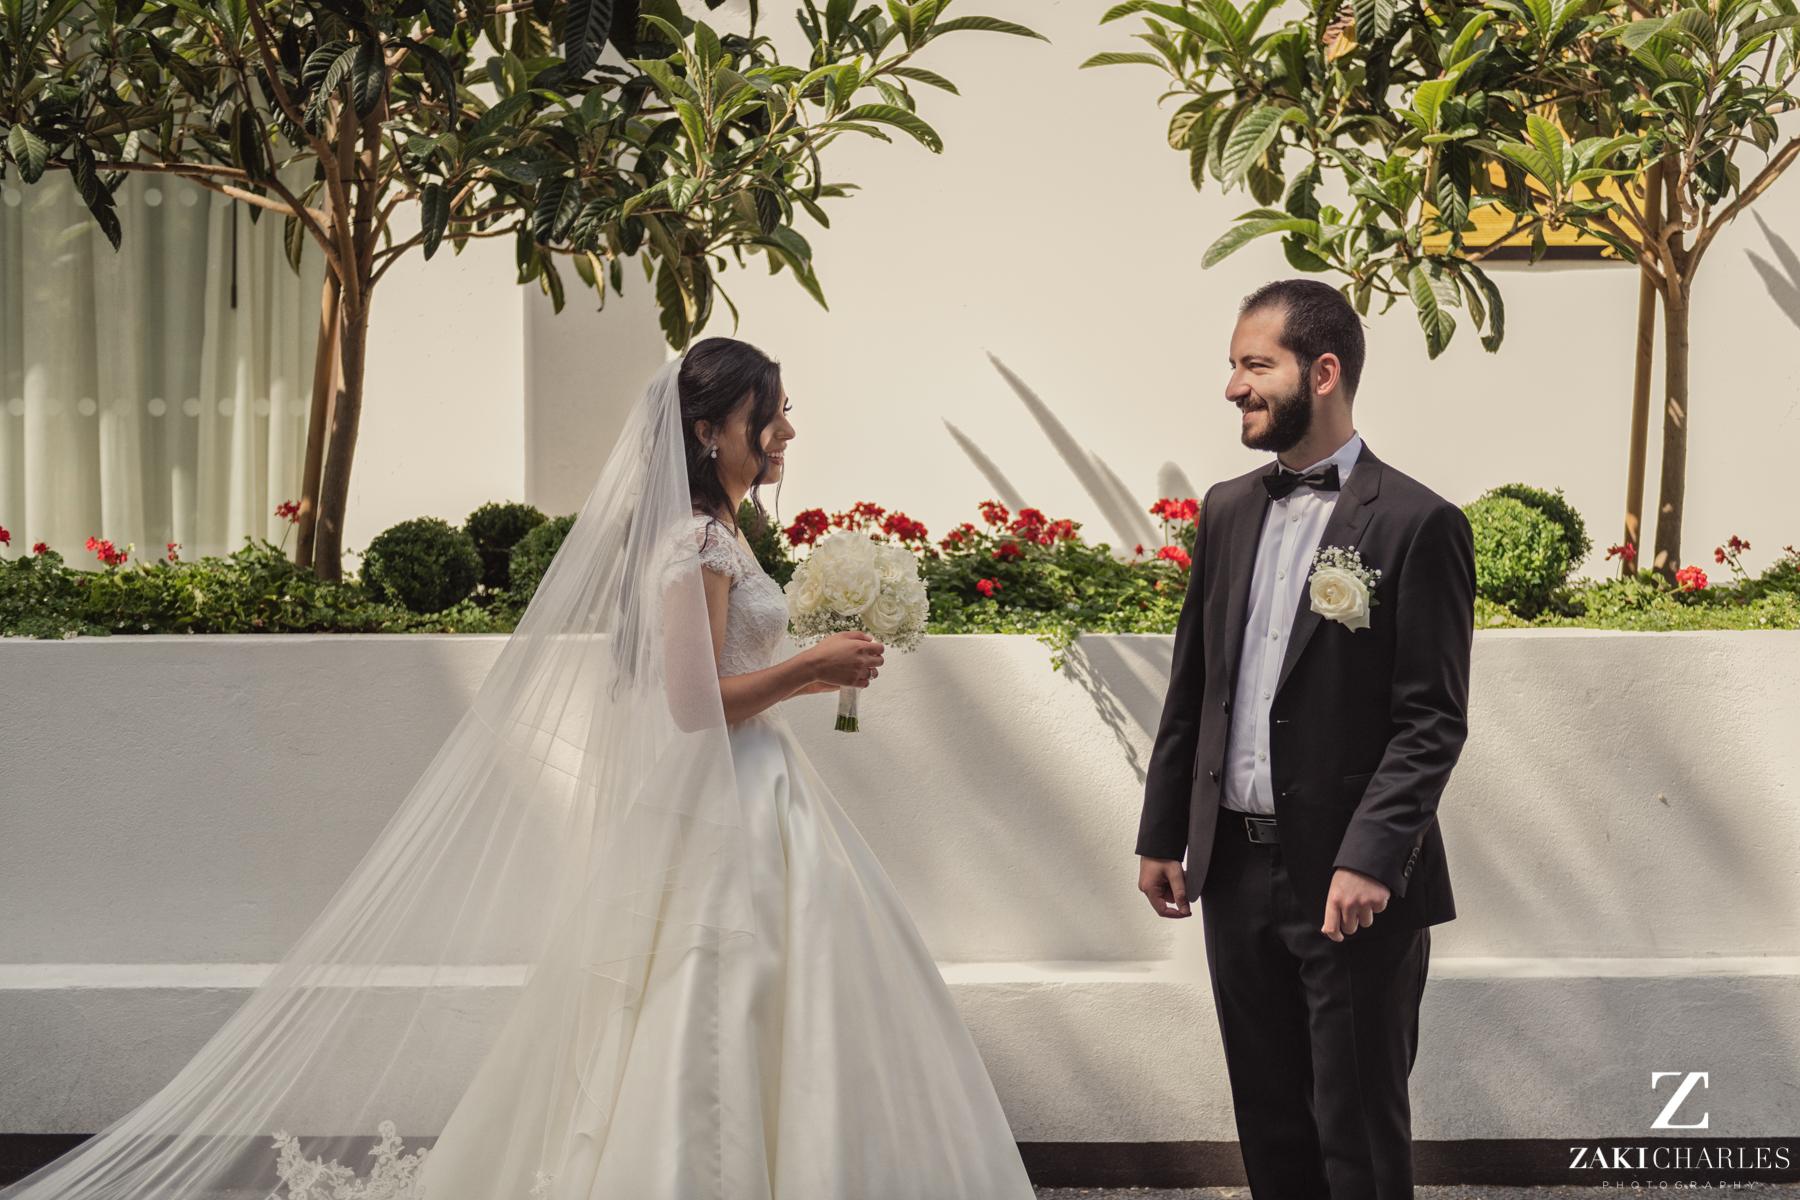 First look between Bride and Groom 6